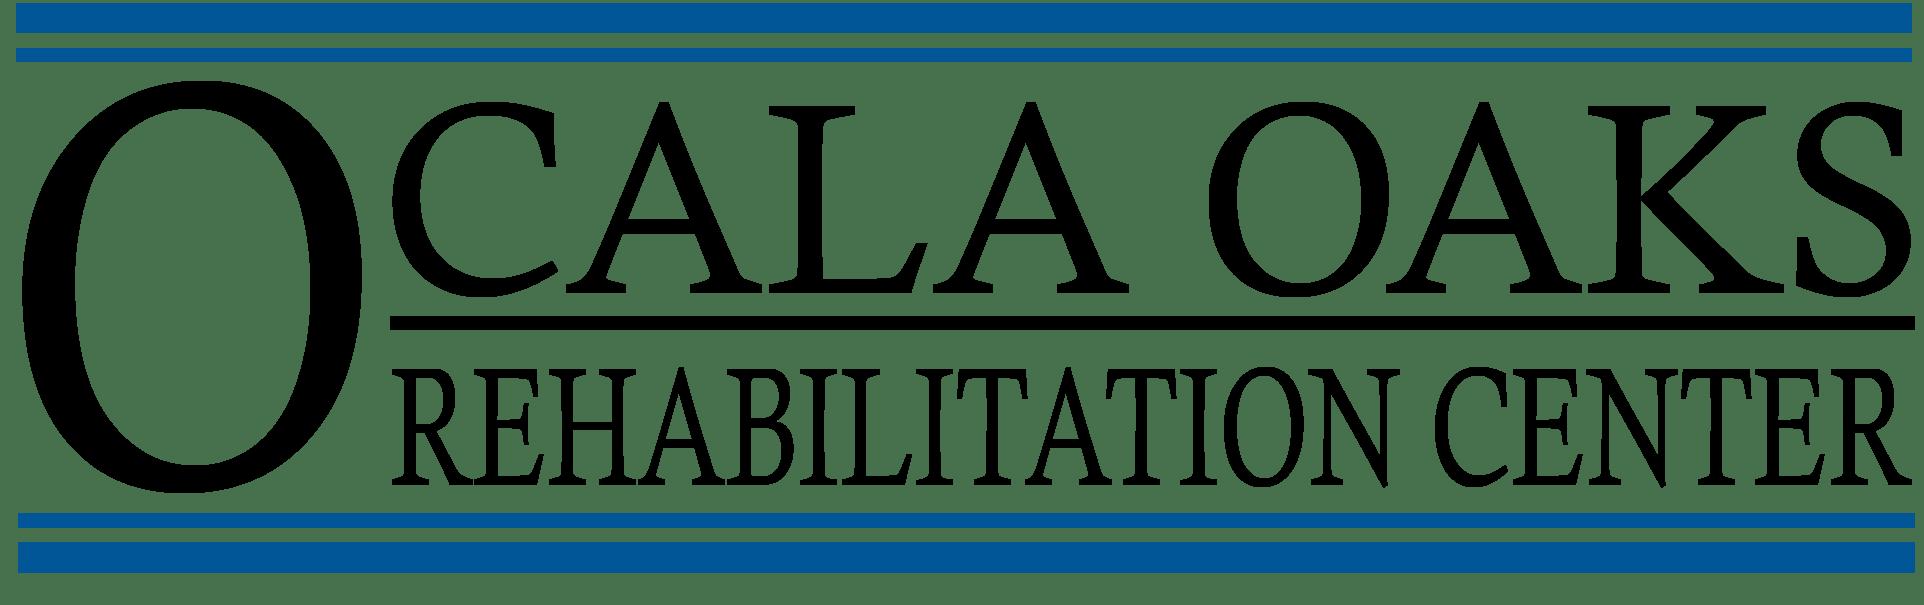 Ocala Oaks Rehabilitation Center logo